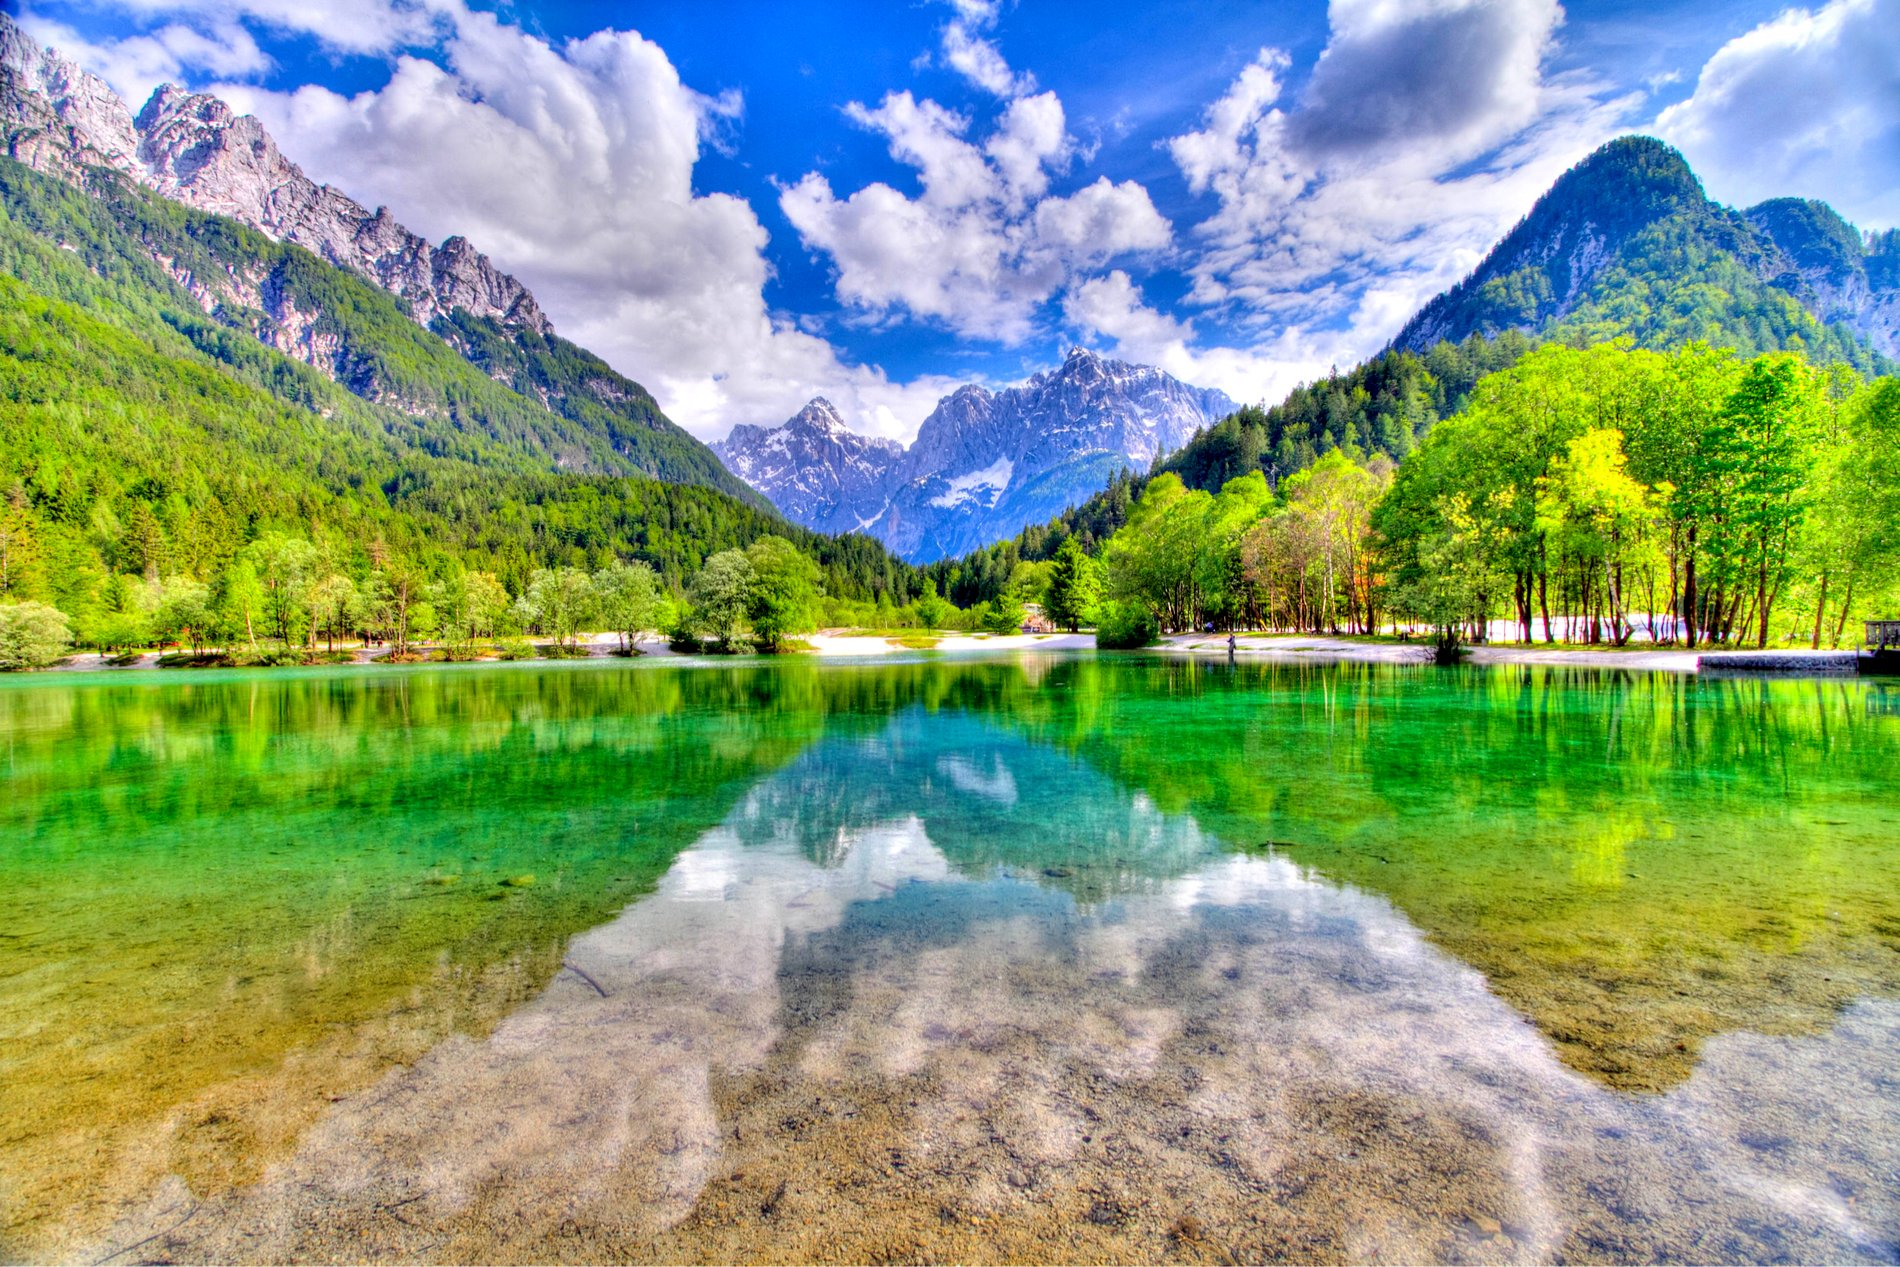 Alpe-Adria Trail: Kranjska Gora to Cividale del Friuli